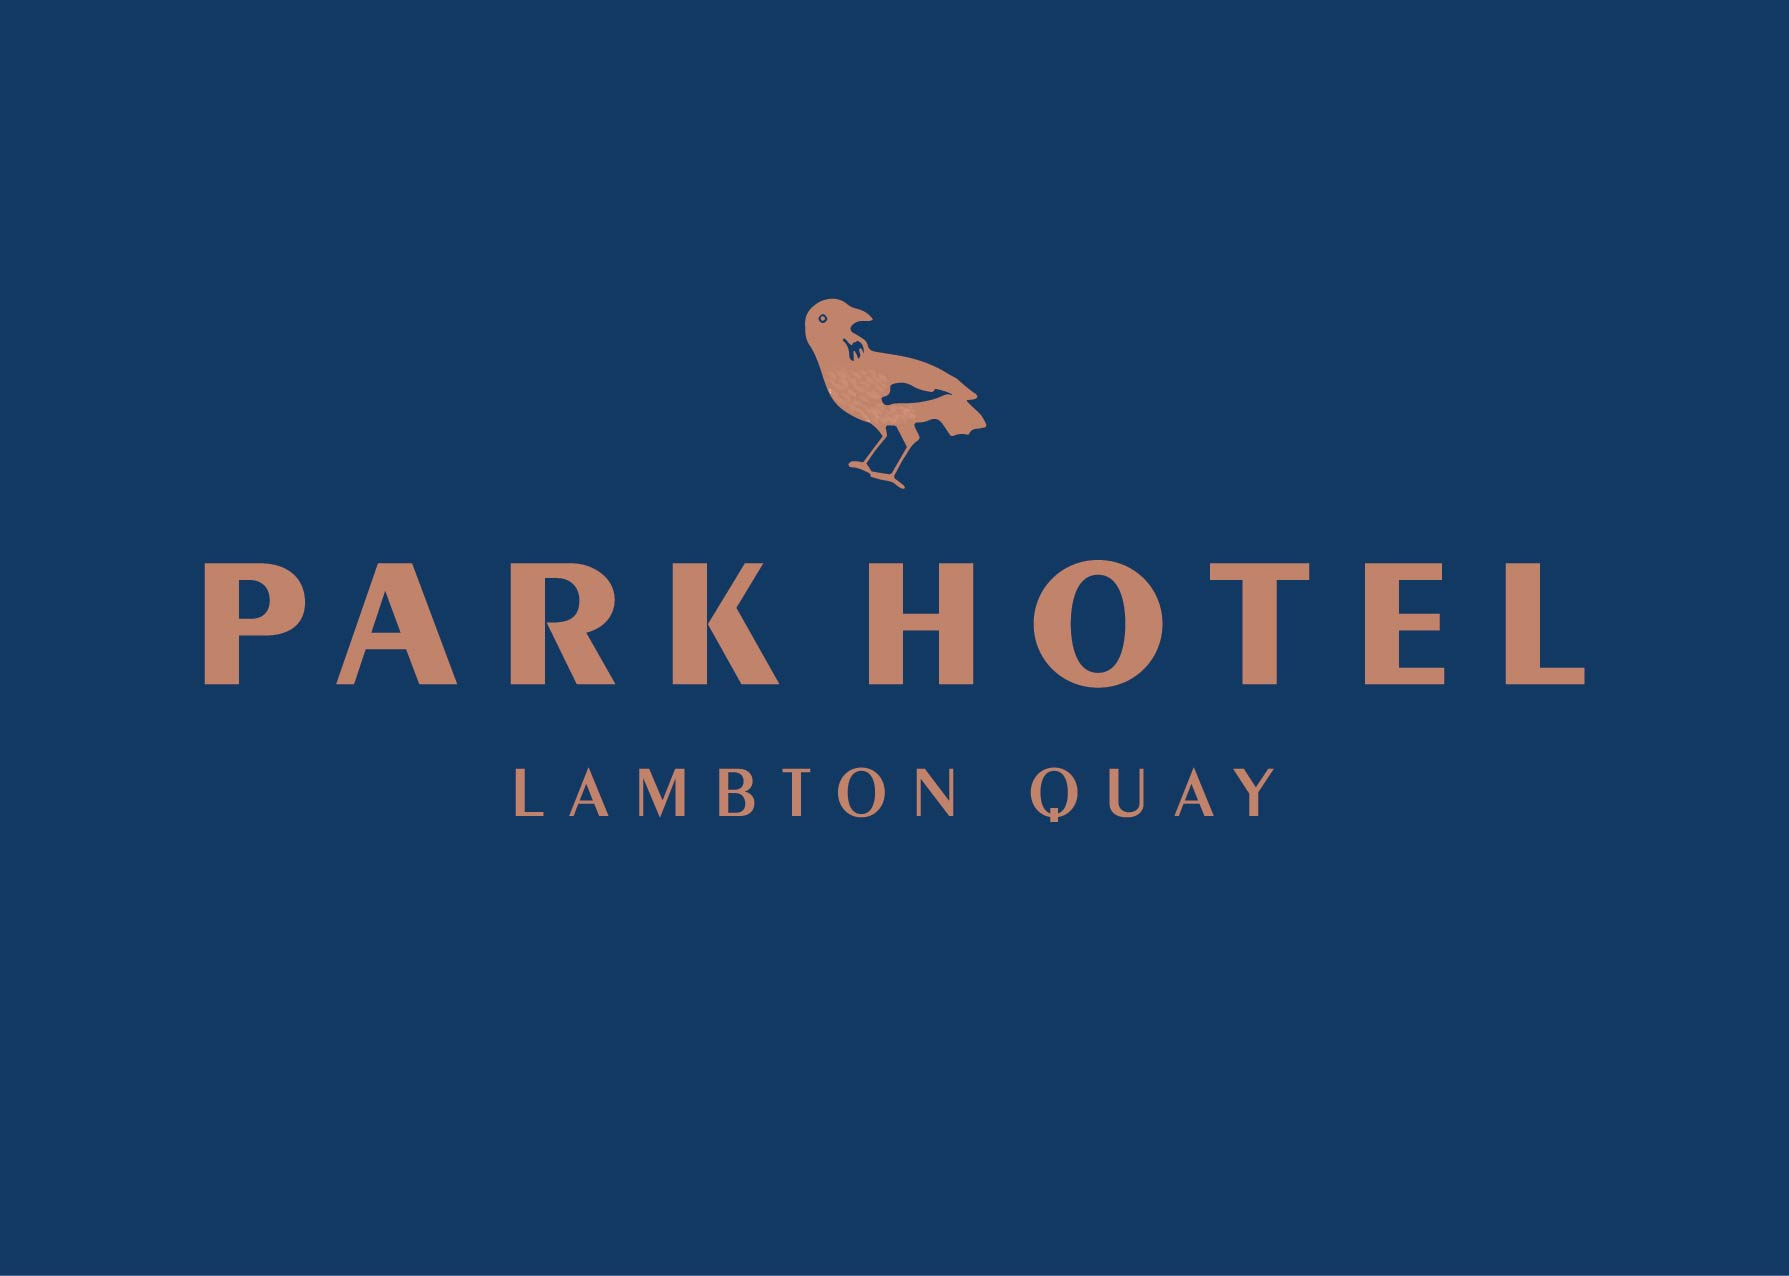 Park Hotel Lambton Quay